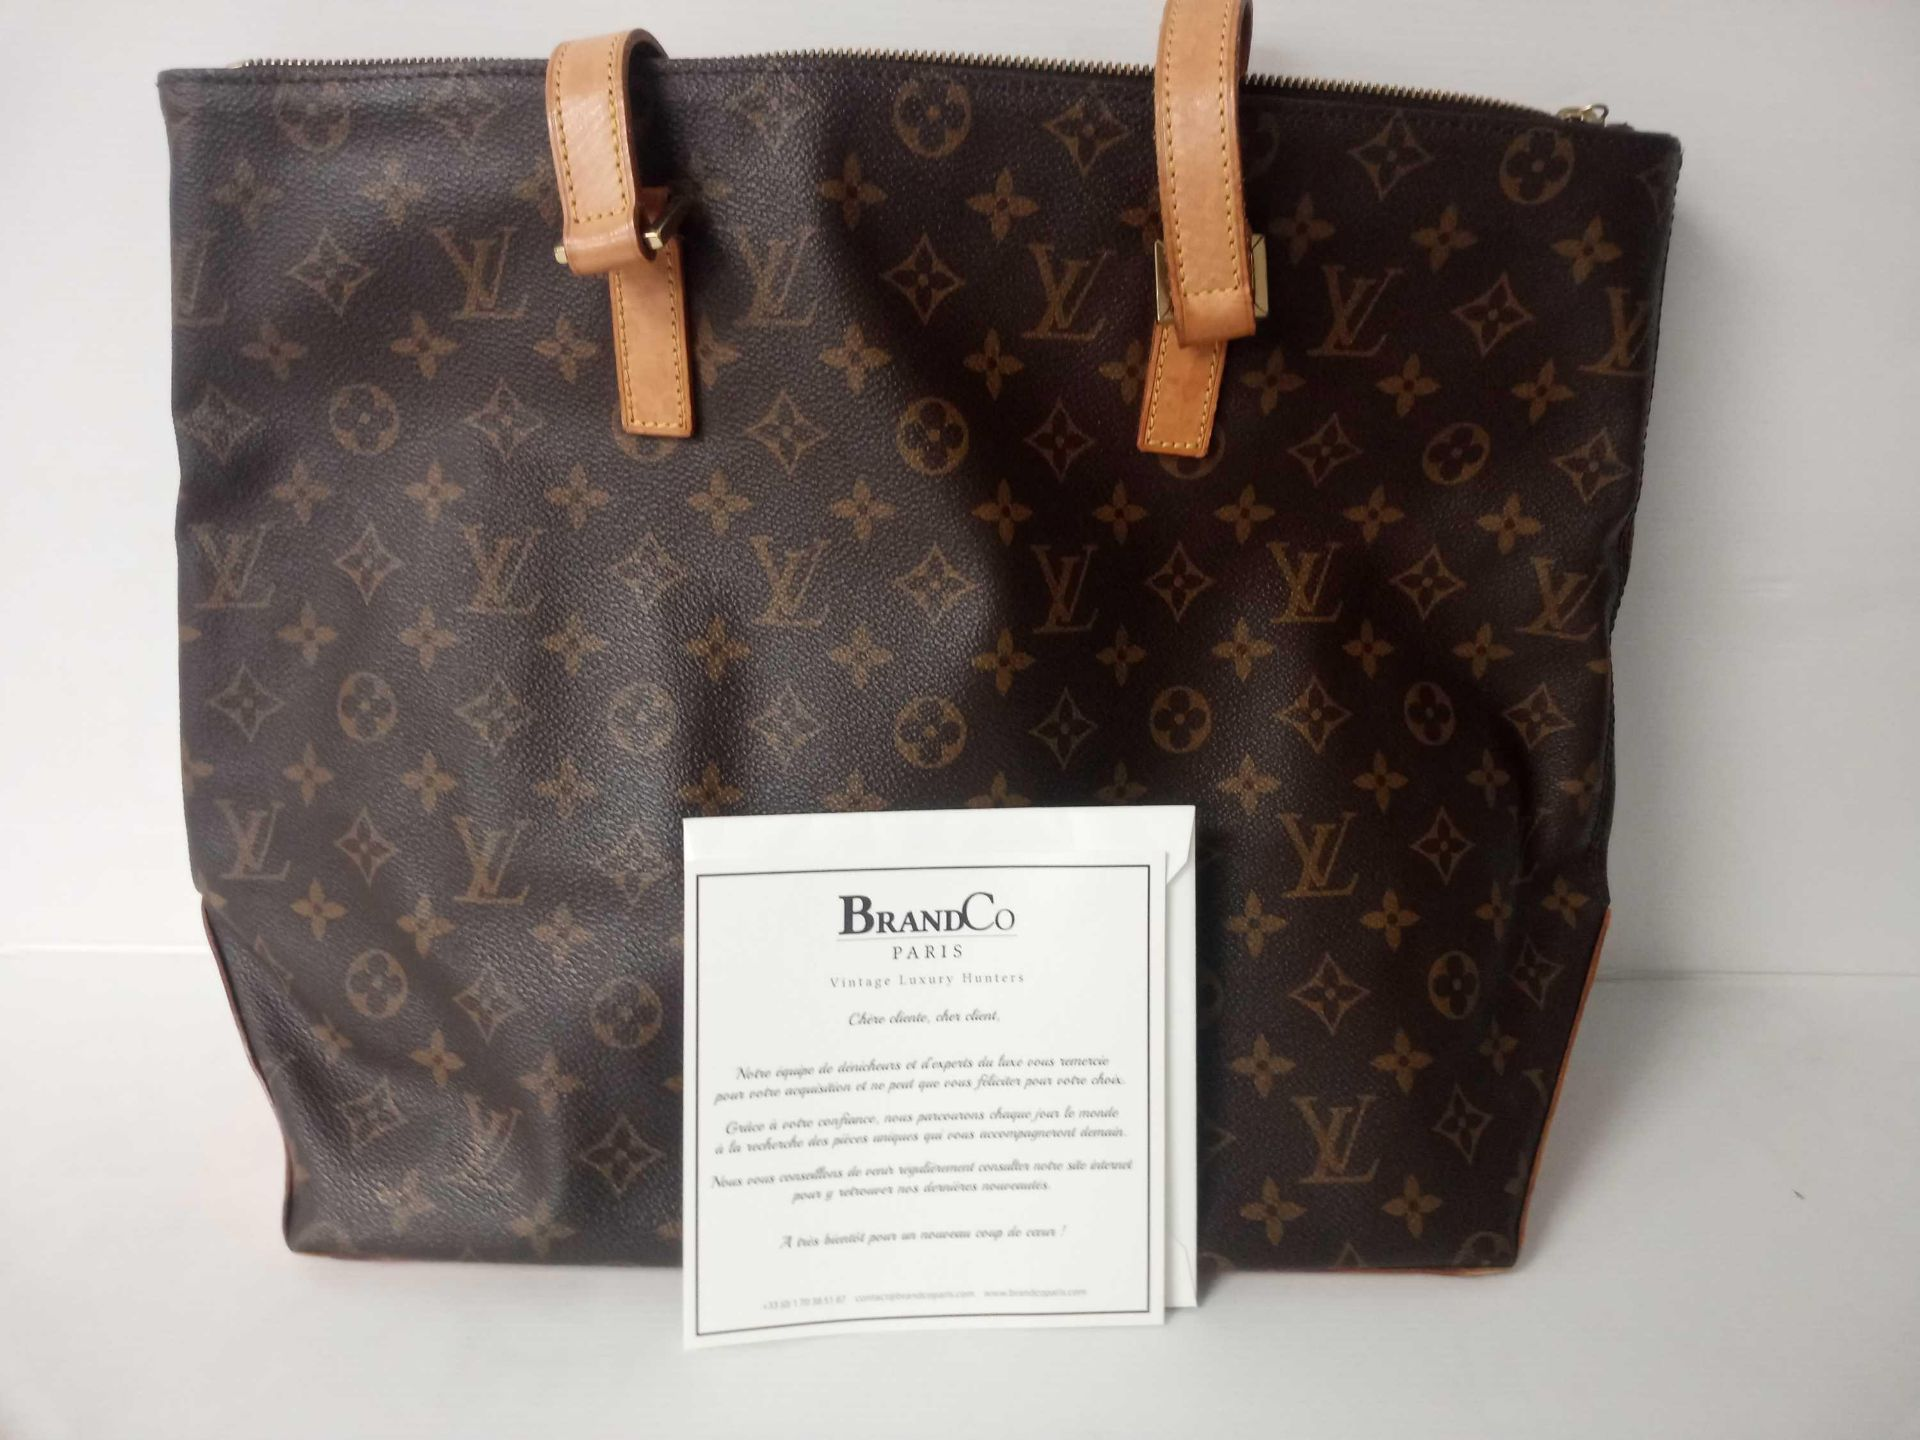 RRP £1020 Louis Vuitton Neverful Monogram Vuitton Leather Shoulder Bag (Appraisals Available On